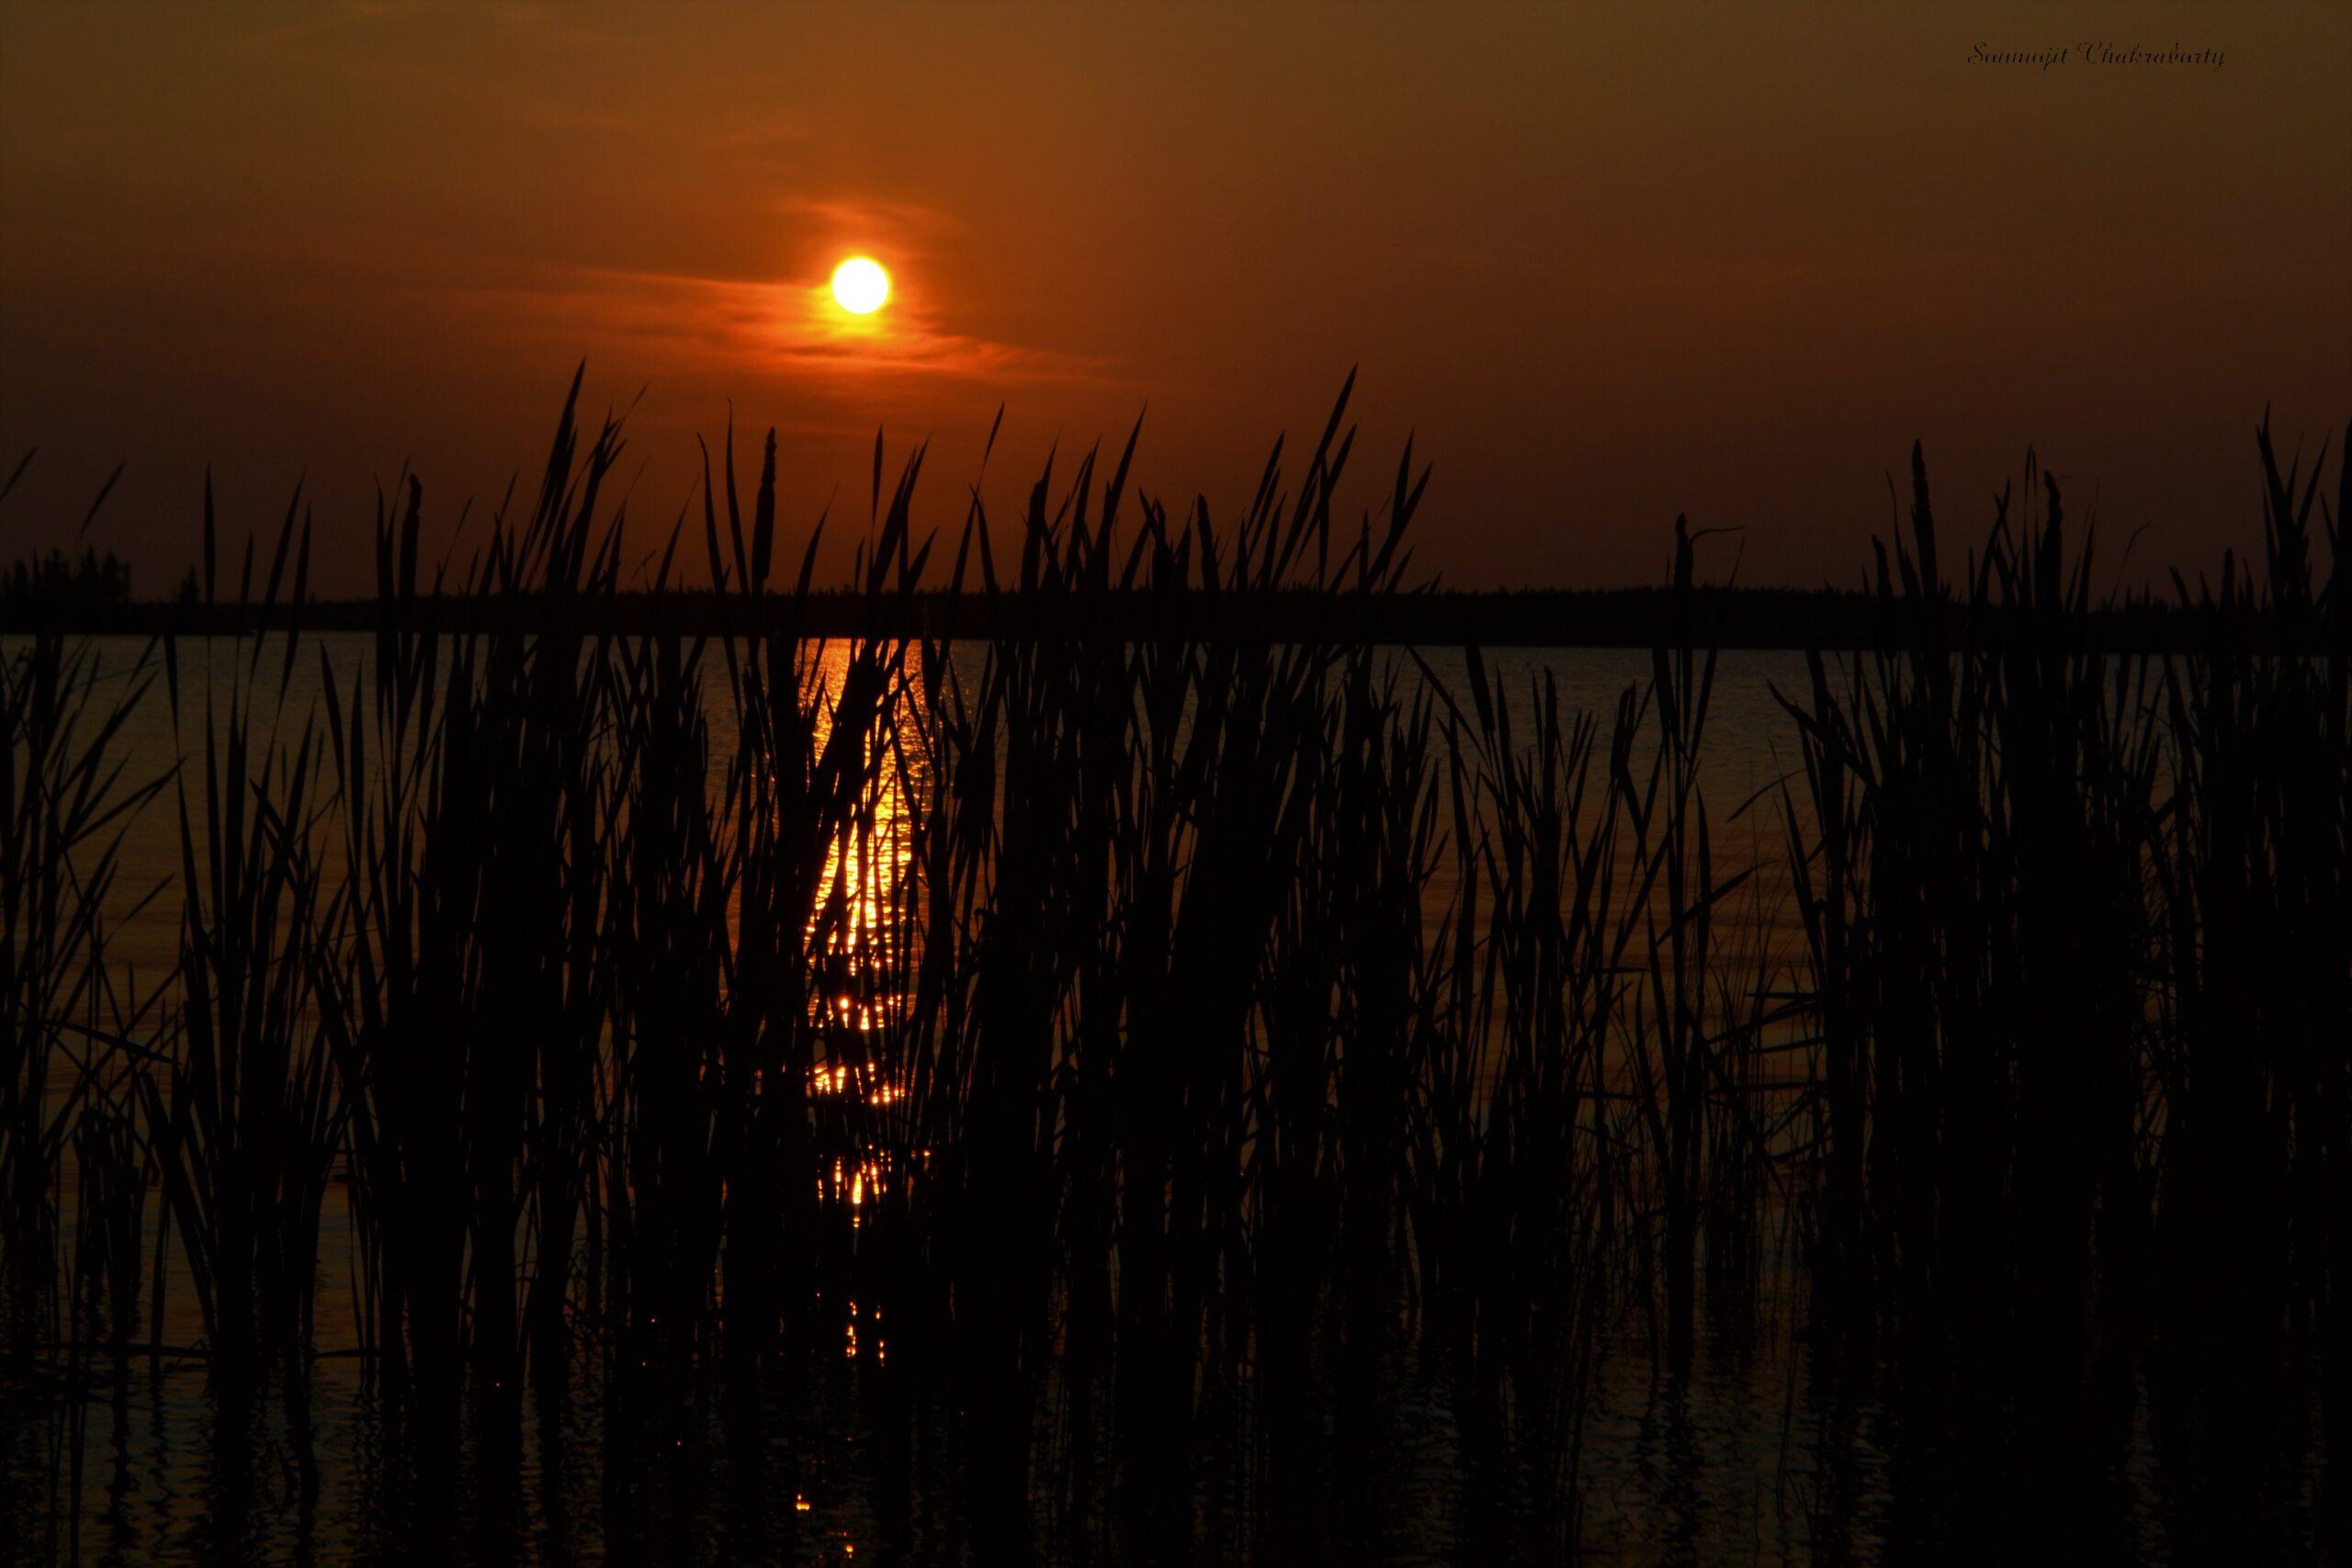 Sunset on the Long lake beach Yellowknife, NWT